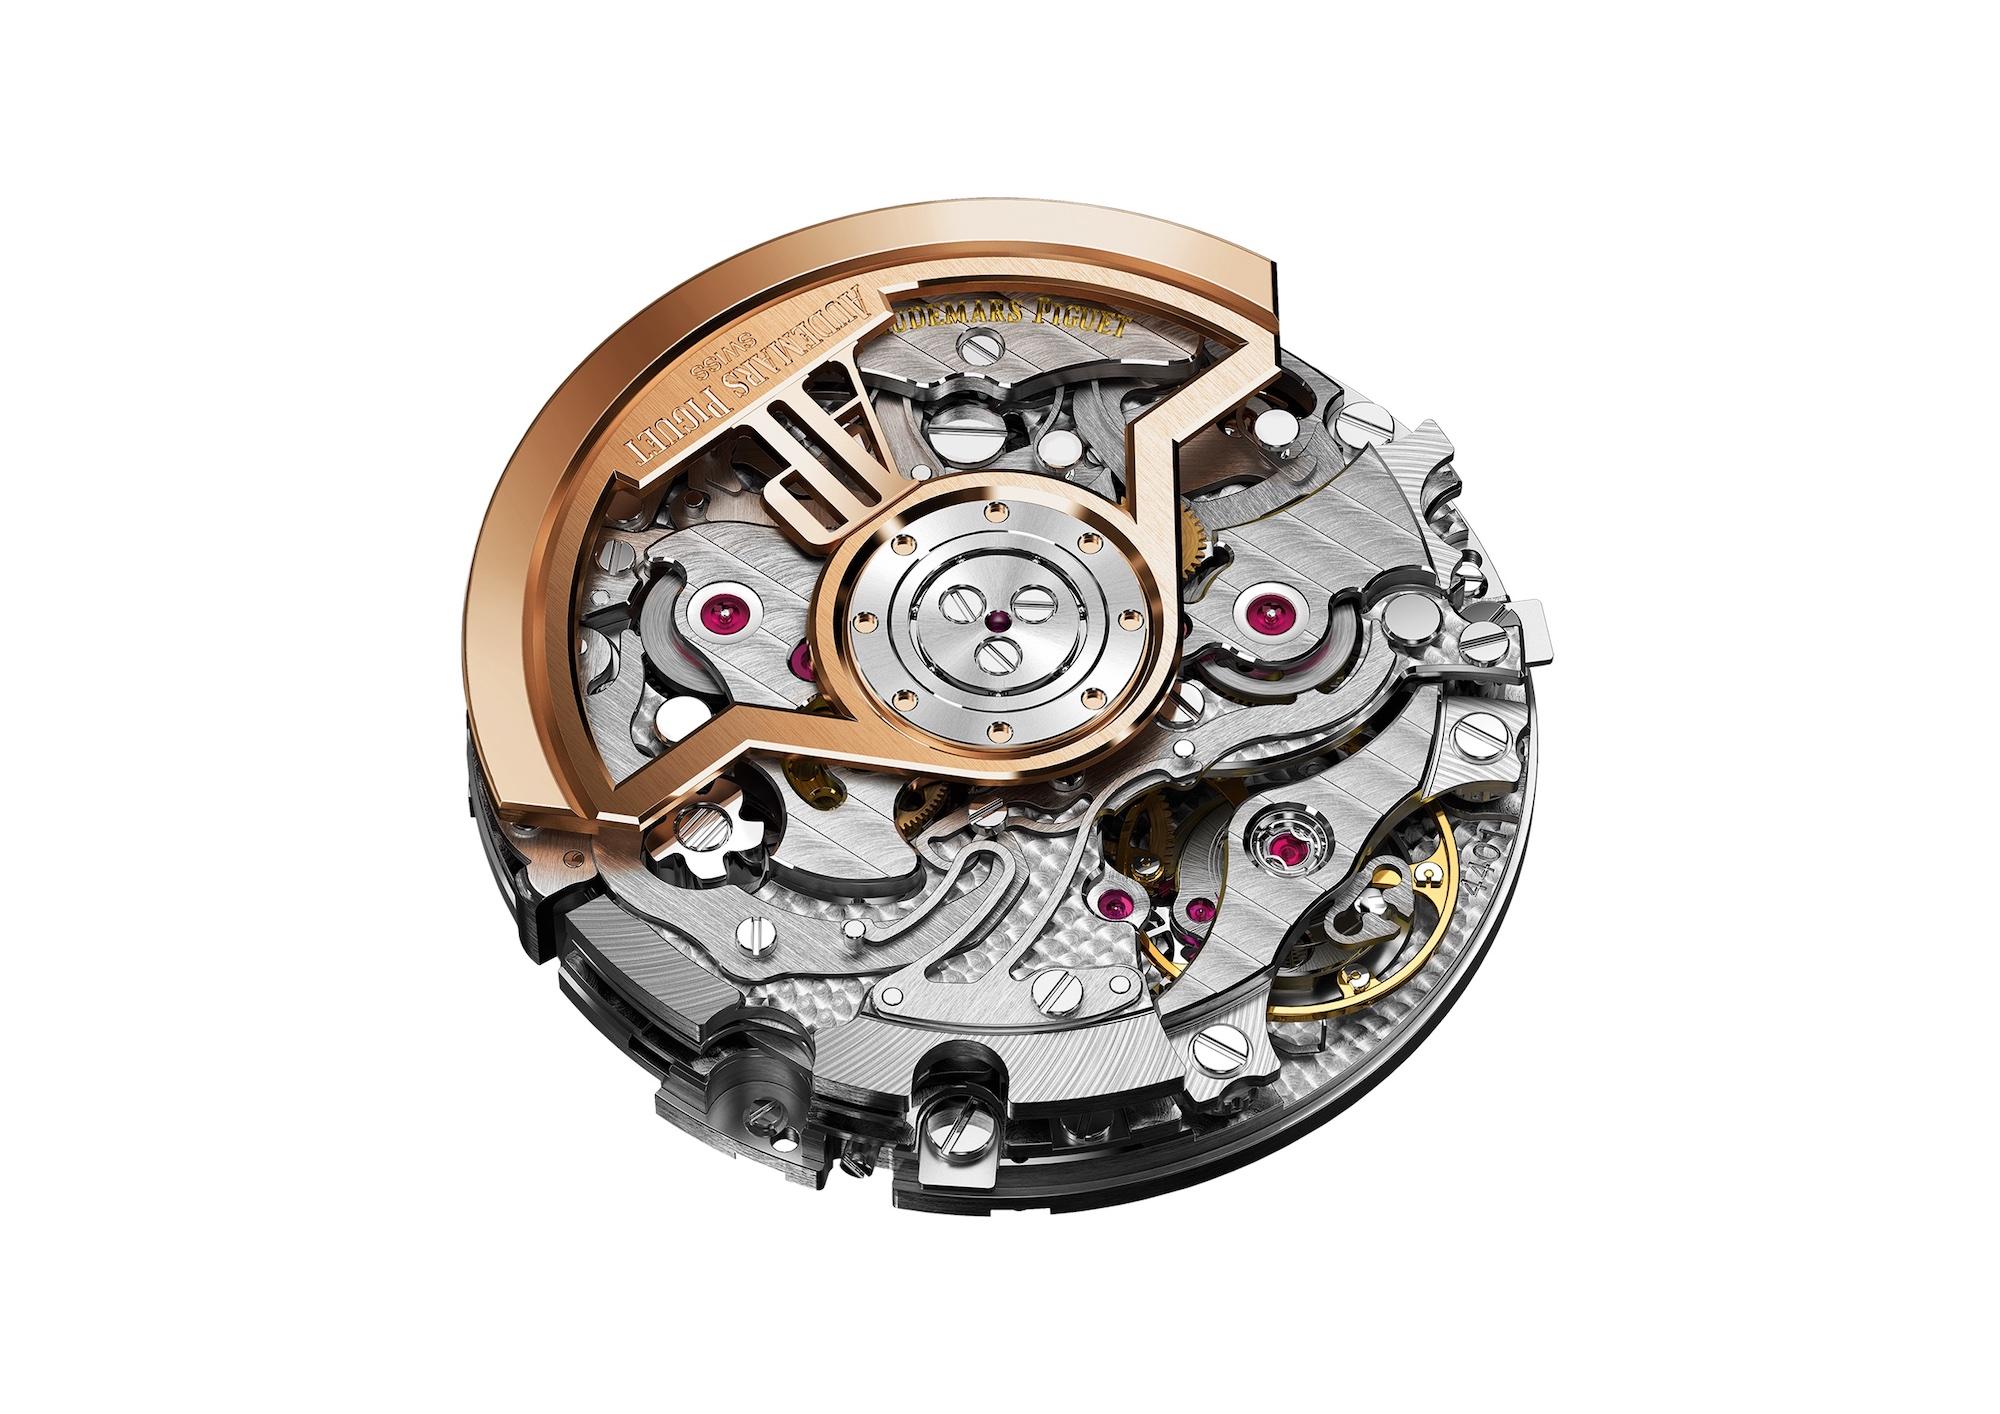 Audemars Piguet Code 11.59 Selfwinding Chronograph 26393NR.OO.A002KB.01 Calibre 4401